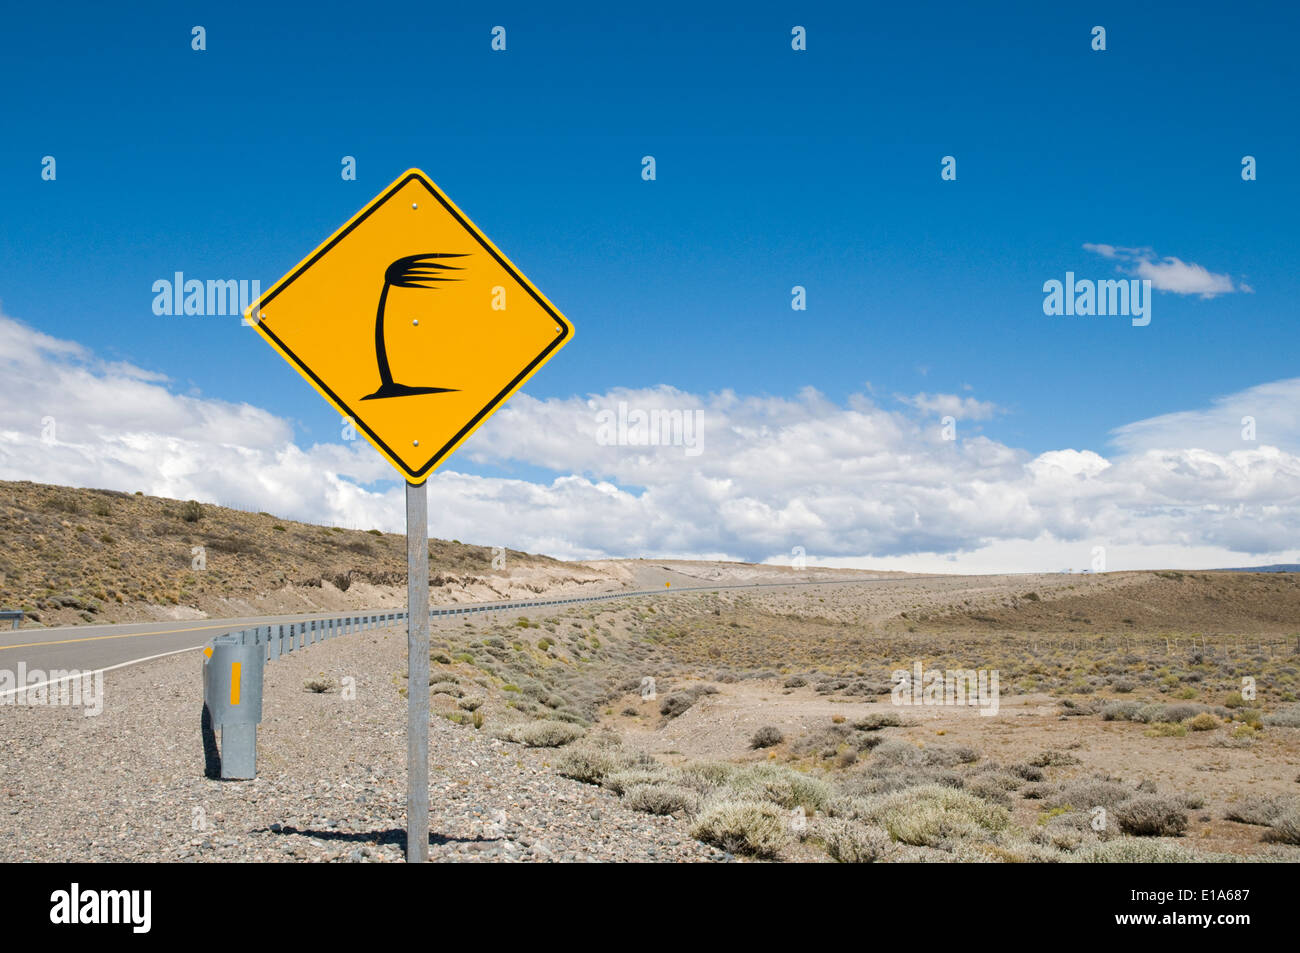 traffic road sign on the Ruta Nacional 40, heavy side wind, Santa Cruz, Patagonia, Argentina - Stock Image